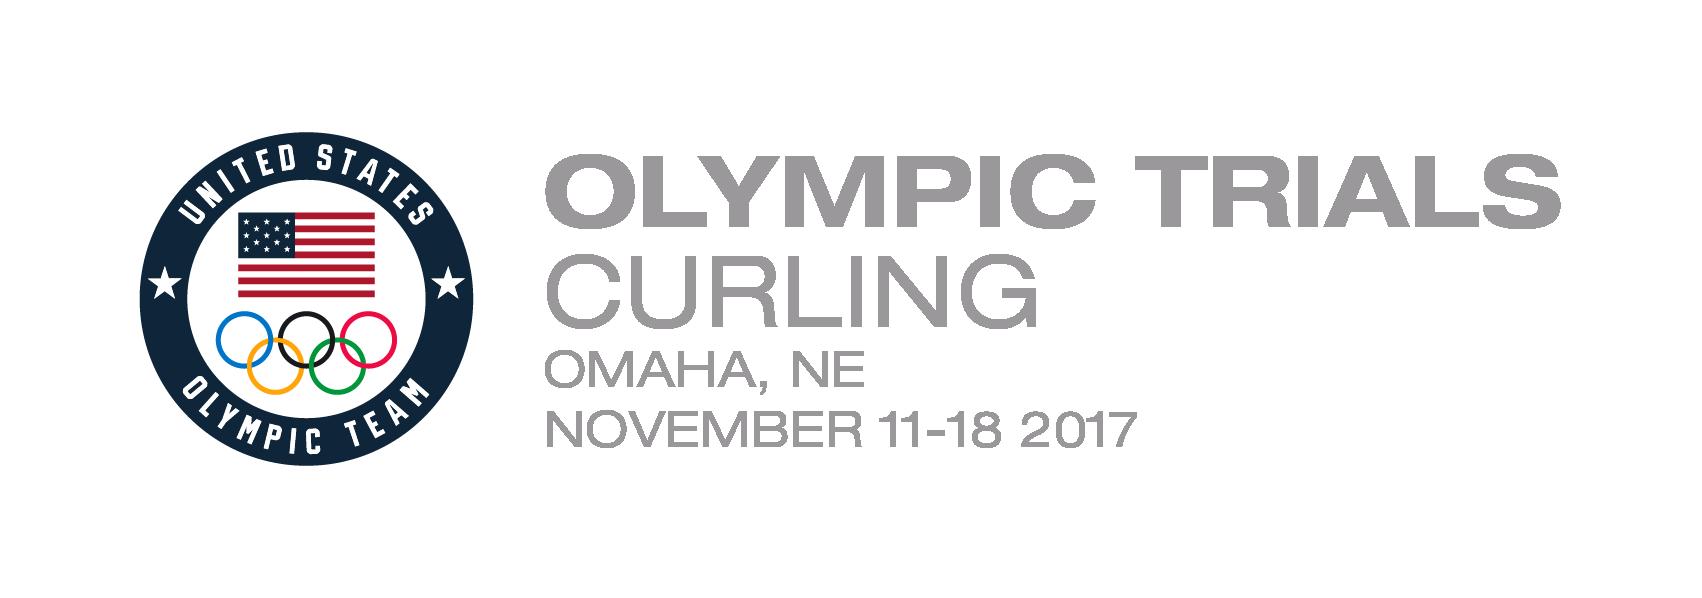 Trials_PC_Curling_Generic_vertical.png